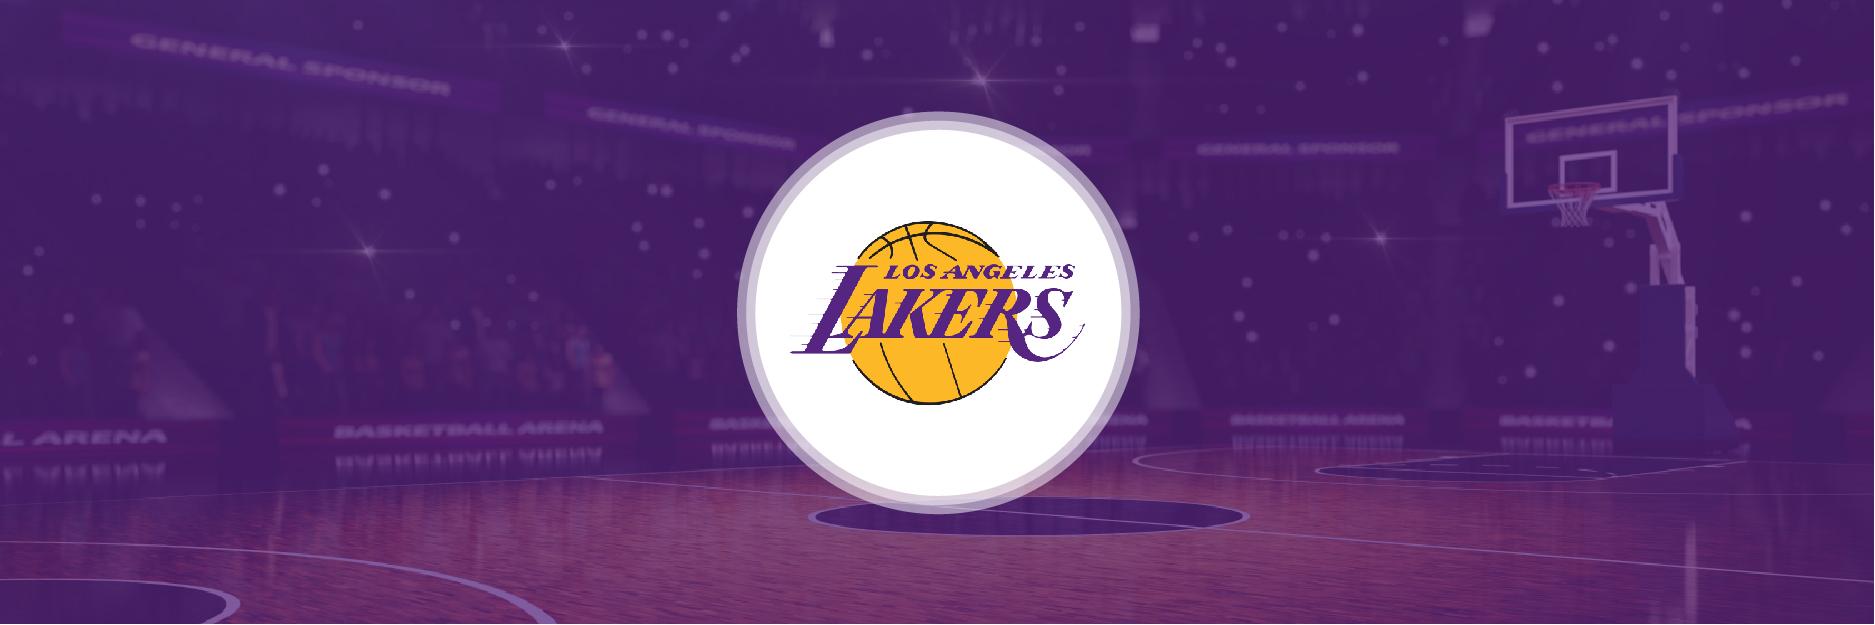 NBA Los Angeles Lakers 2020 Season Analysis